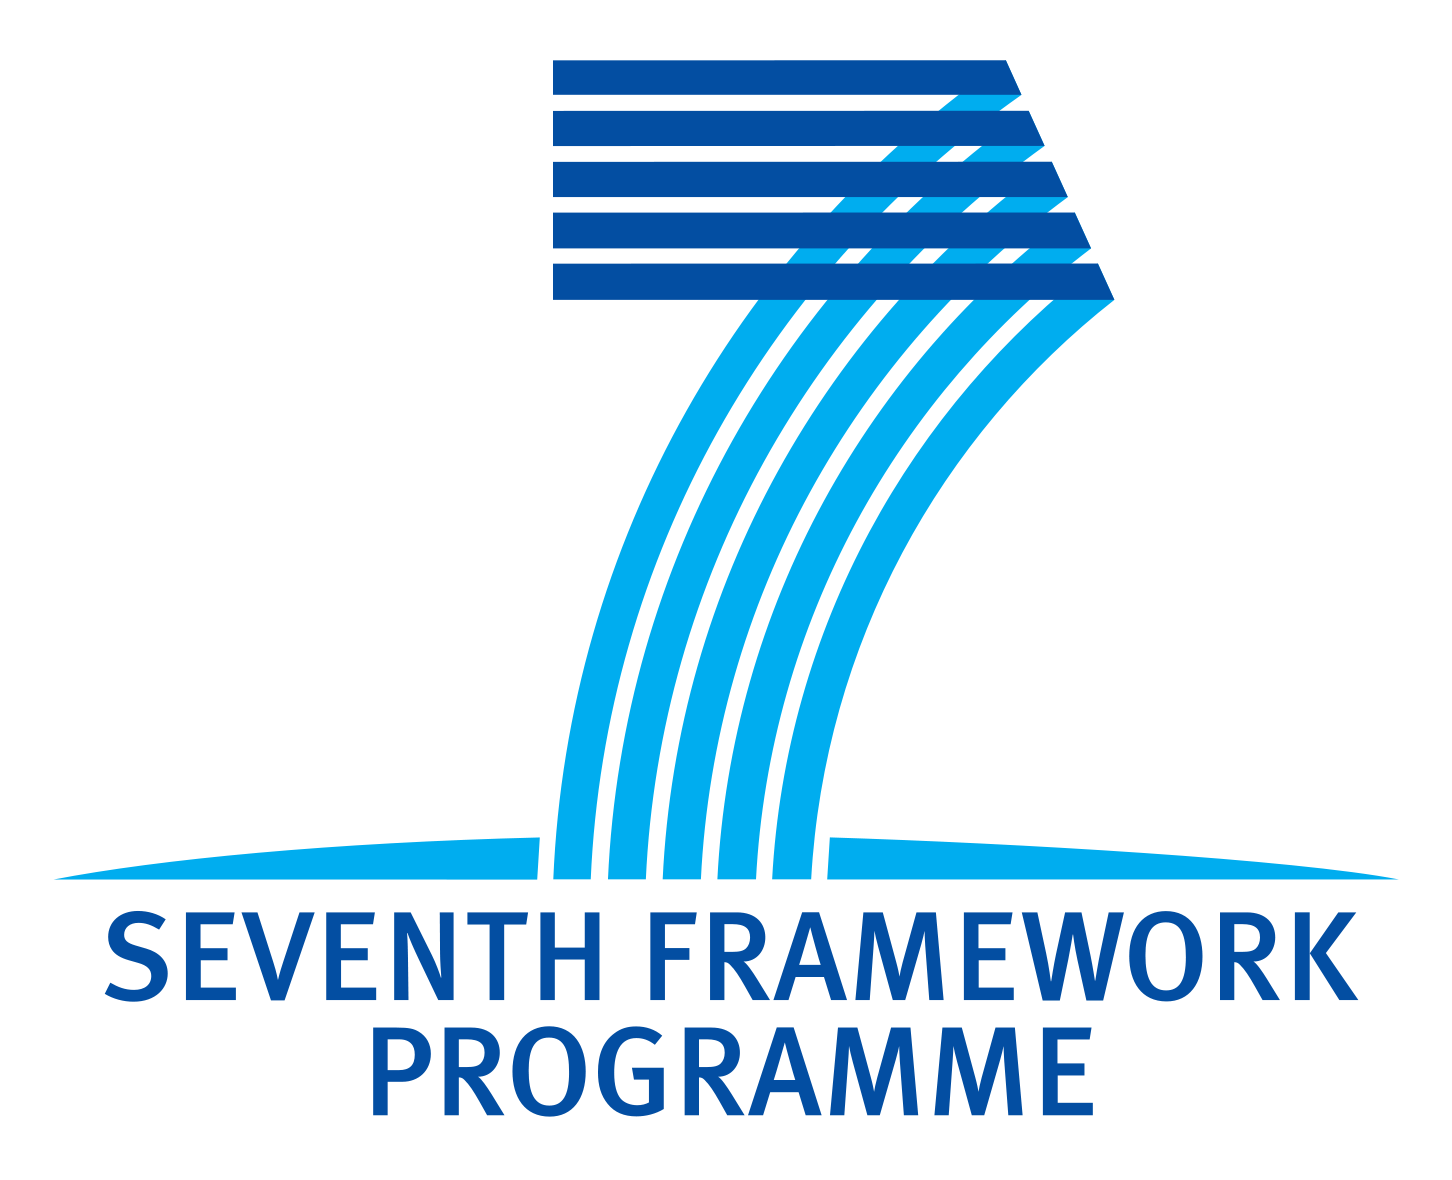 seventhframeworkprogrammelogo.png